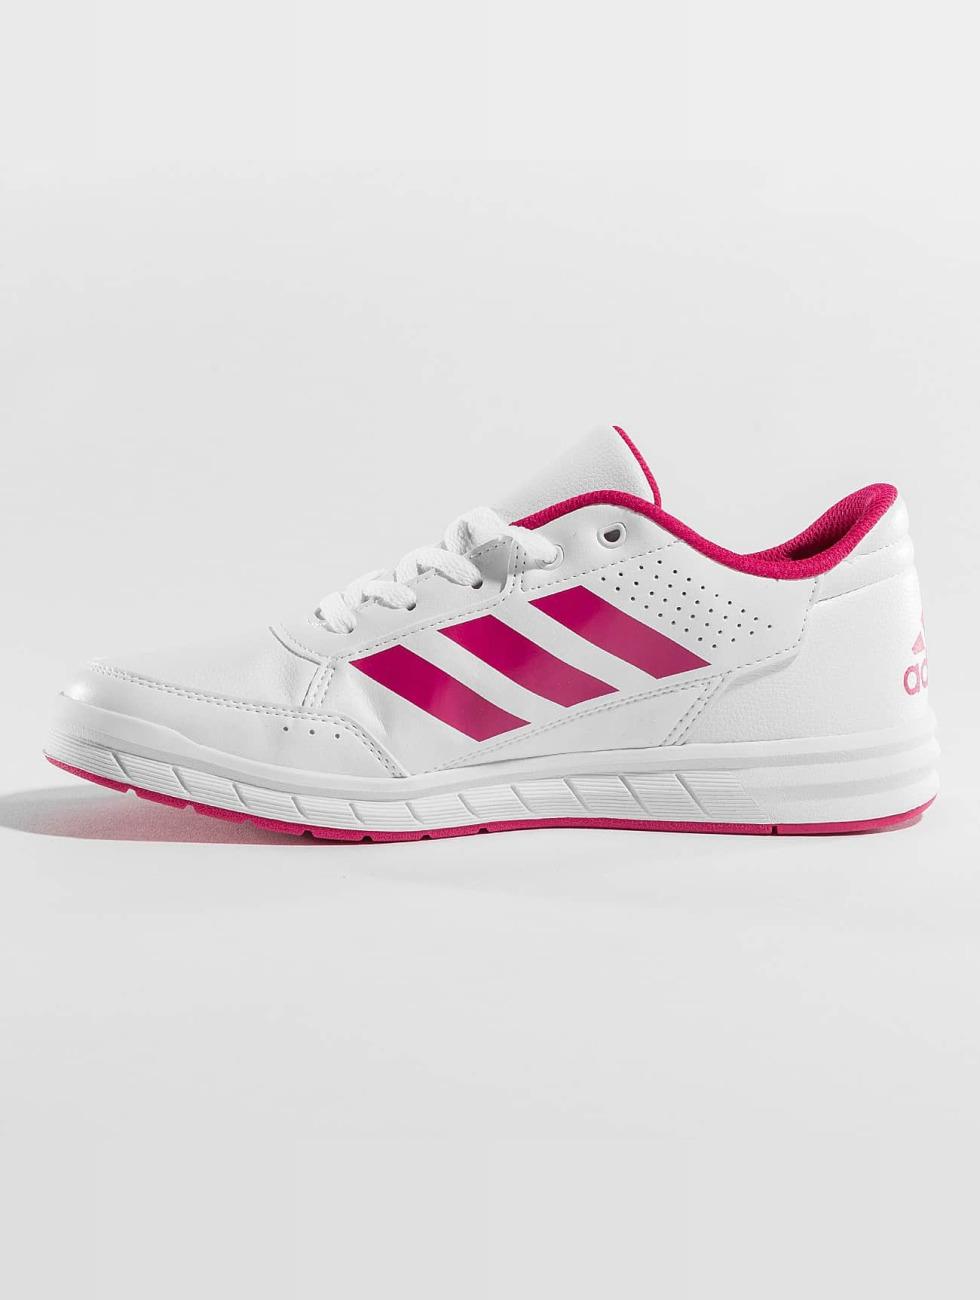 Adidas Performance Schoen / Sneaker Alta Sport In Ingegno 381.643 swFiUCYcSf